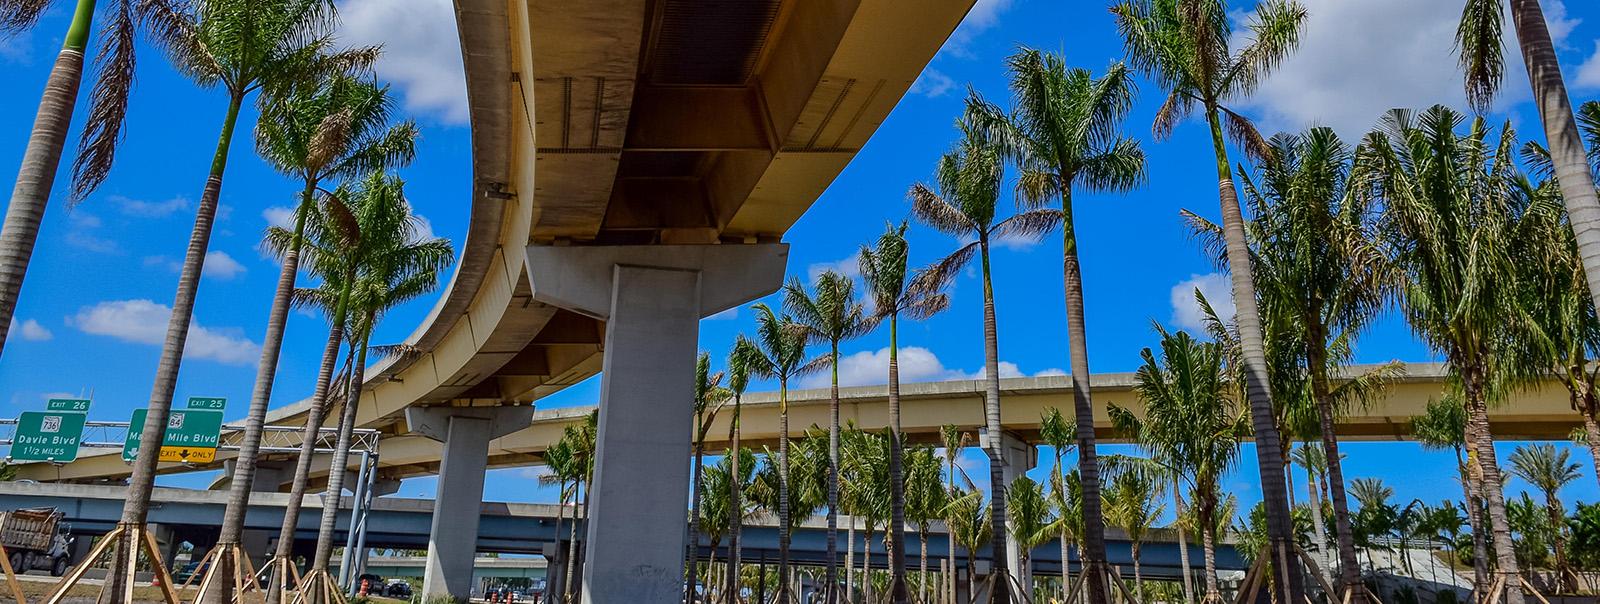 bridge-and-palm-trees